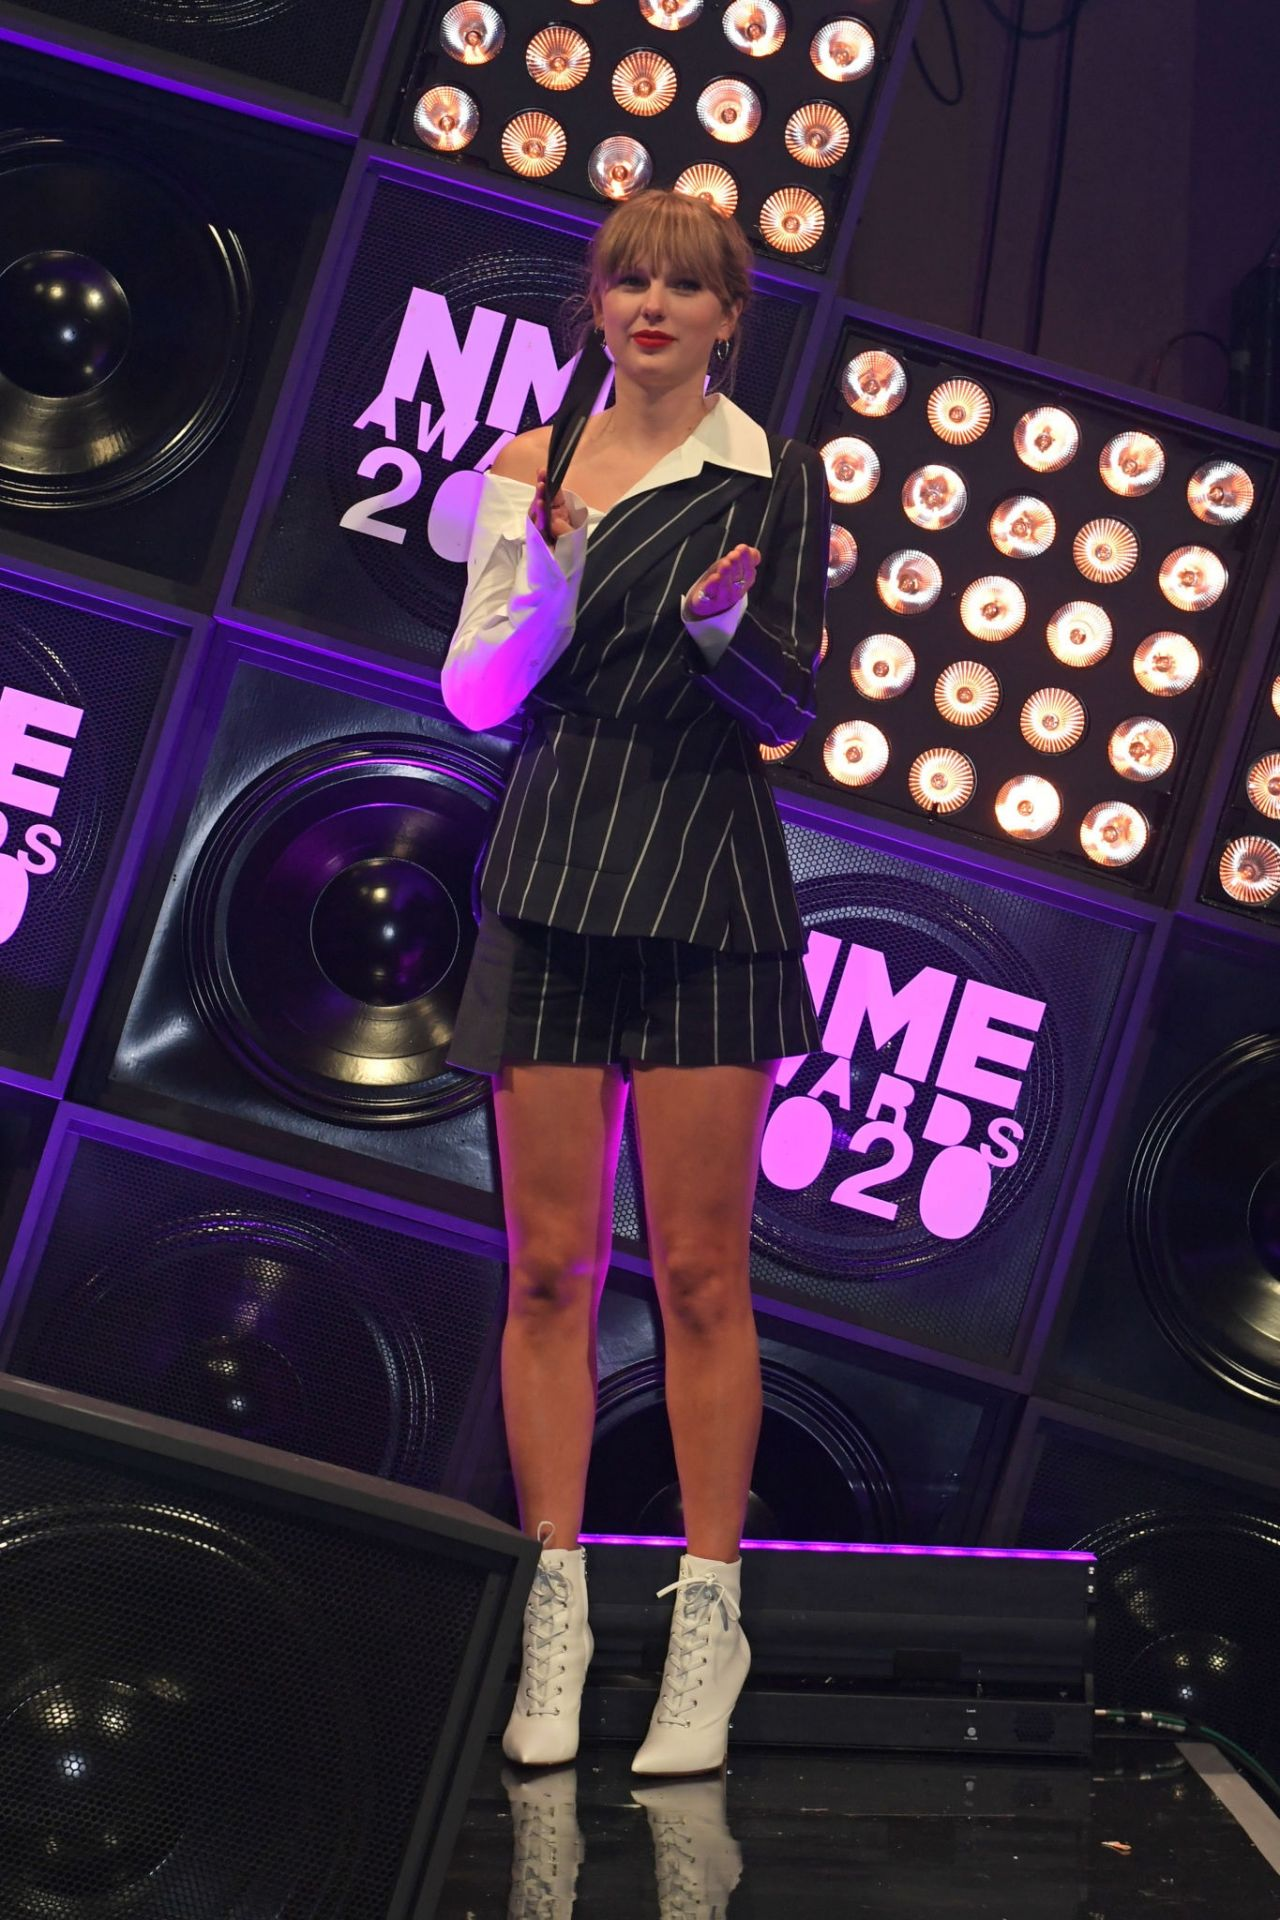 Taylor Swift Nme Awards 2020 More Photos